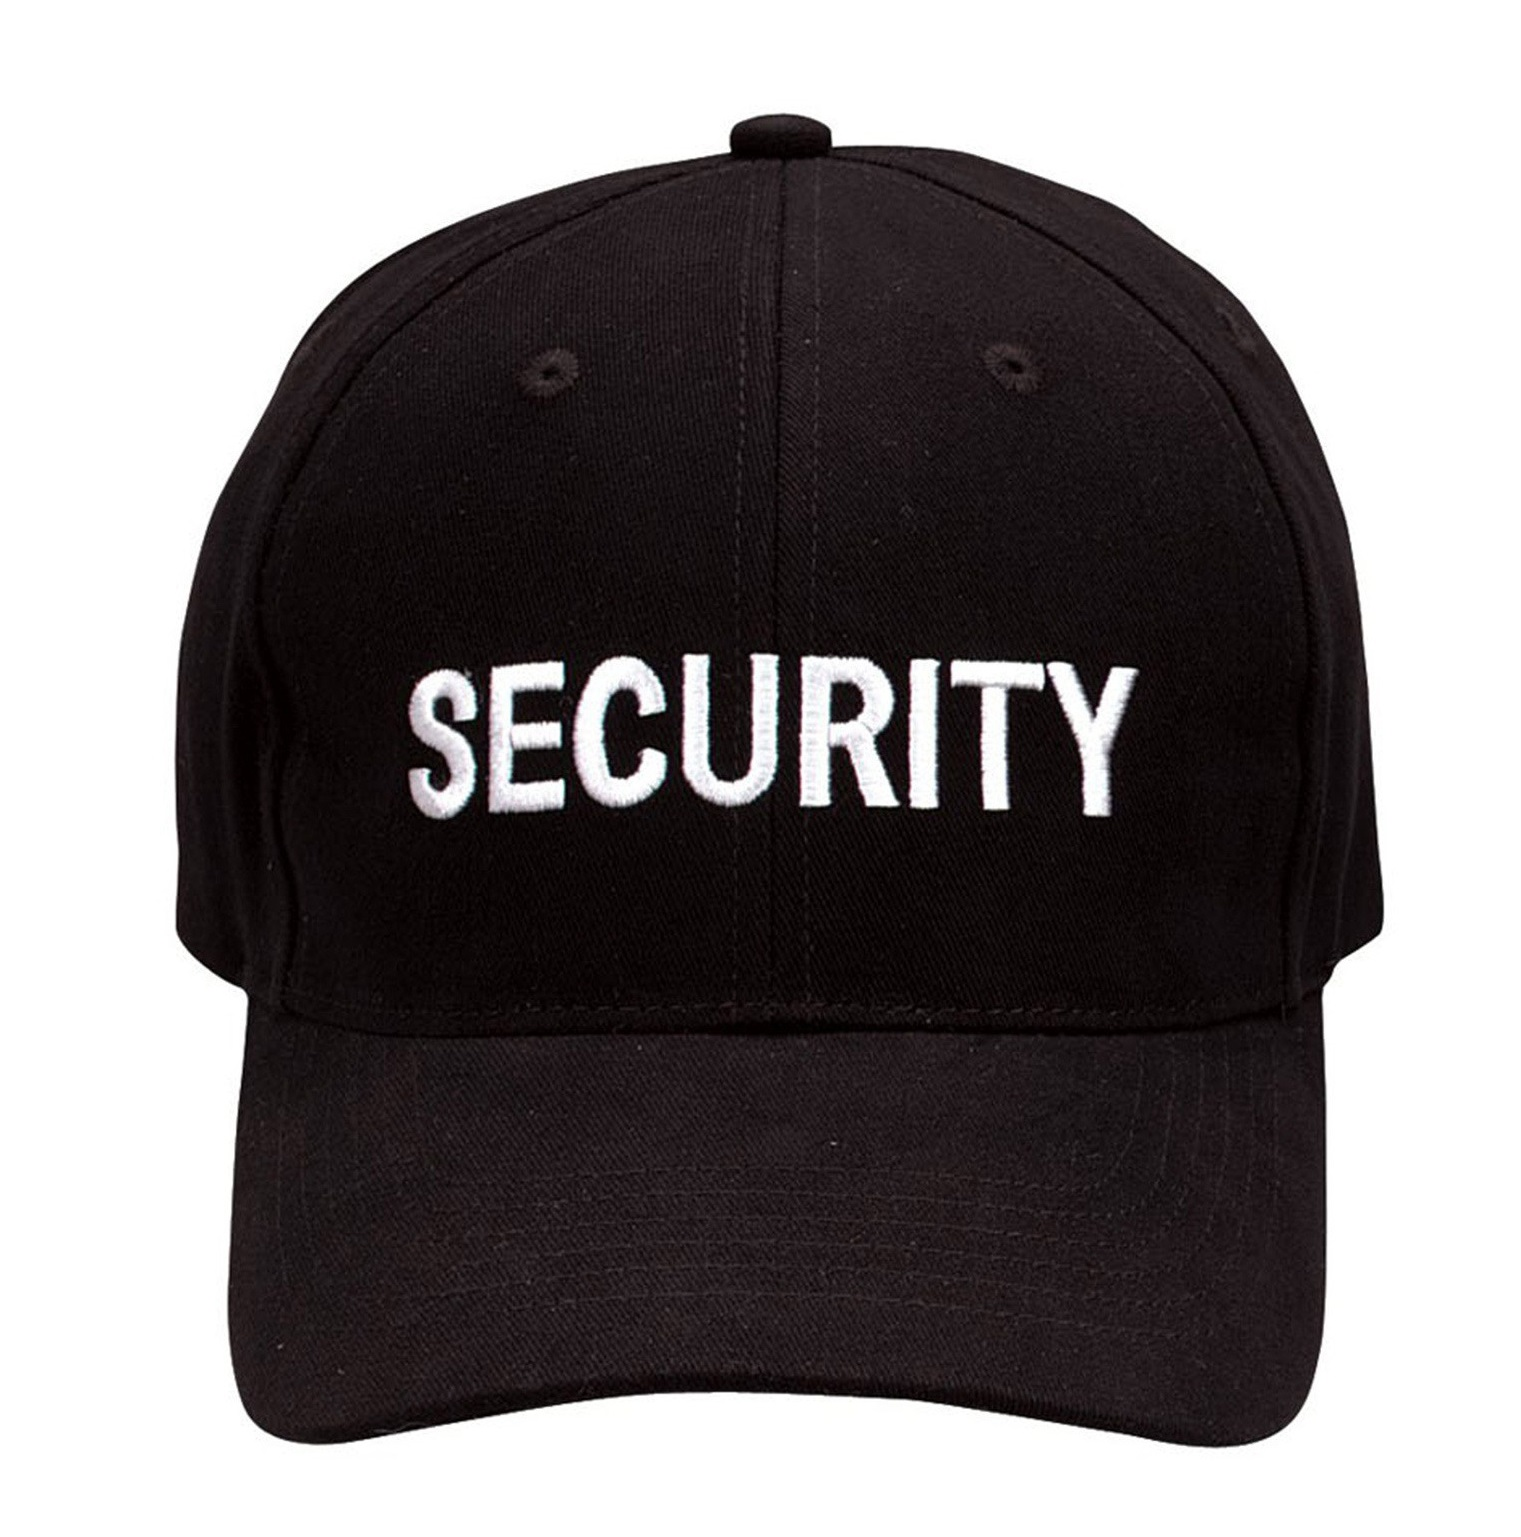 Security Black Baseball Hat